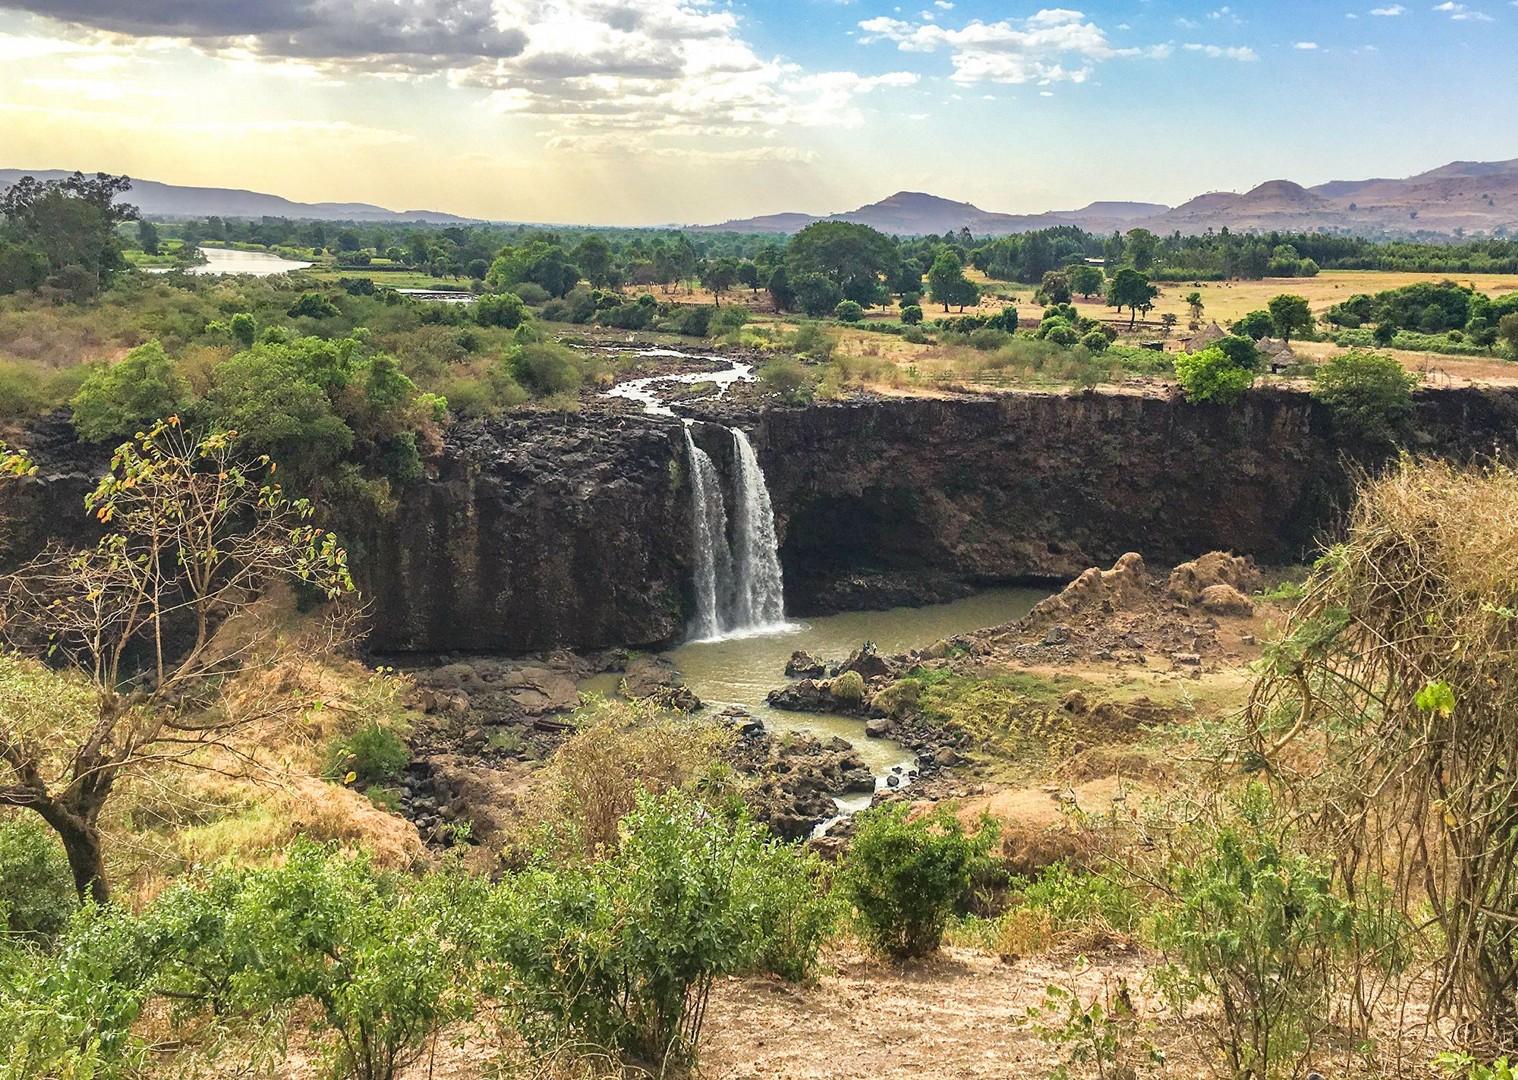 waterfall-ethiopia-cycling-adventure-saddle-skedaddle-holiday.jpg - NEW! Ethiopia - Enchanting Ethiopia - Cycling Adventures